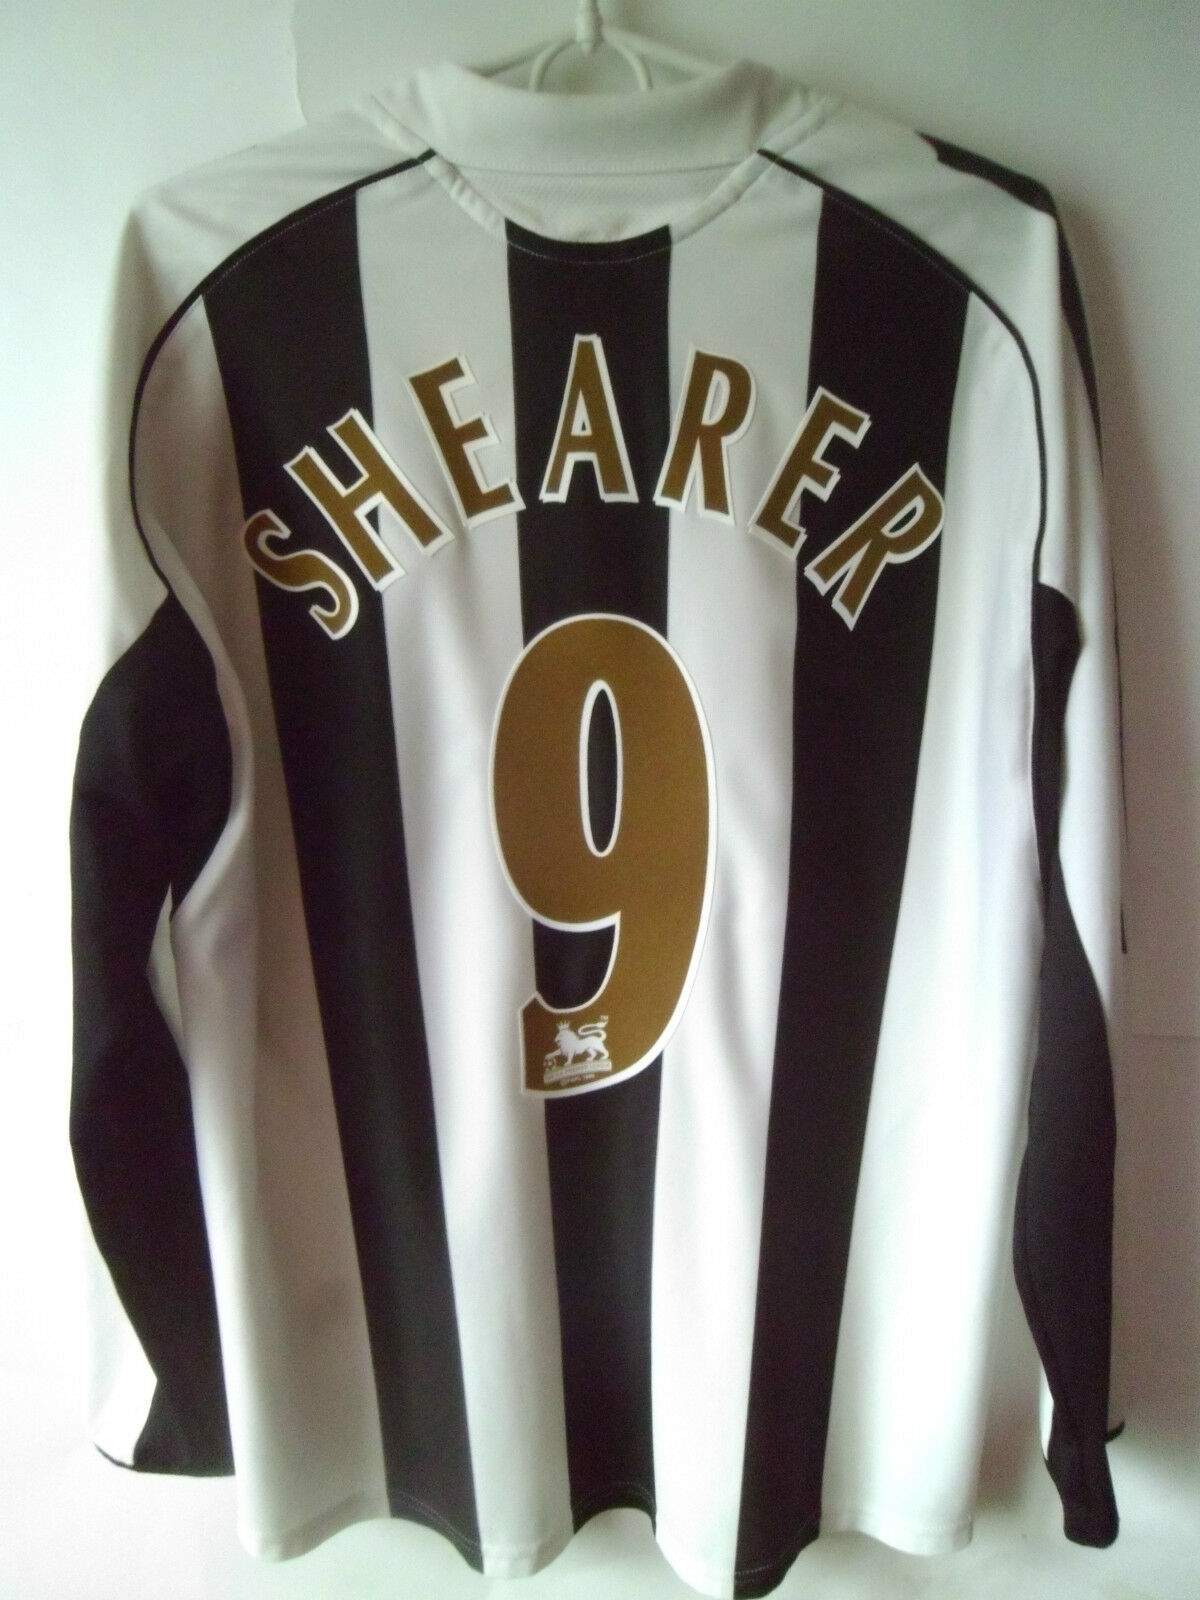 VERY RARE    SHEARER     2005-07 Newcastle Home Shirt Jersey Trikot M